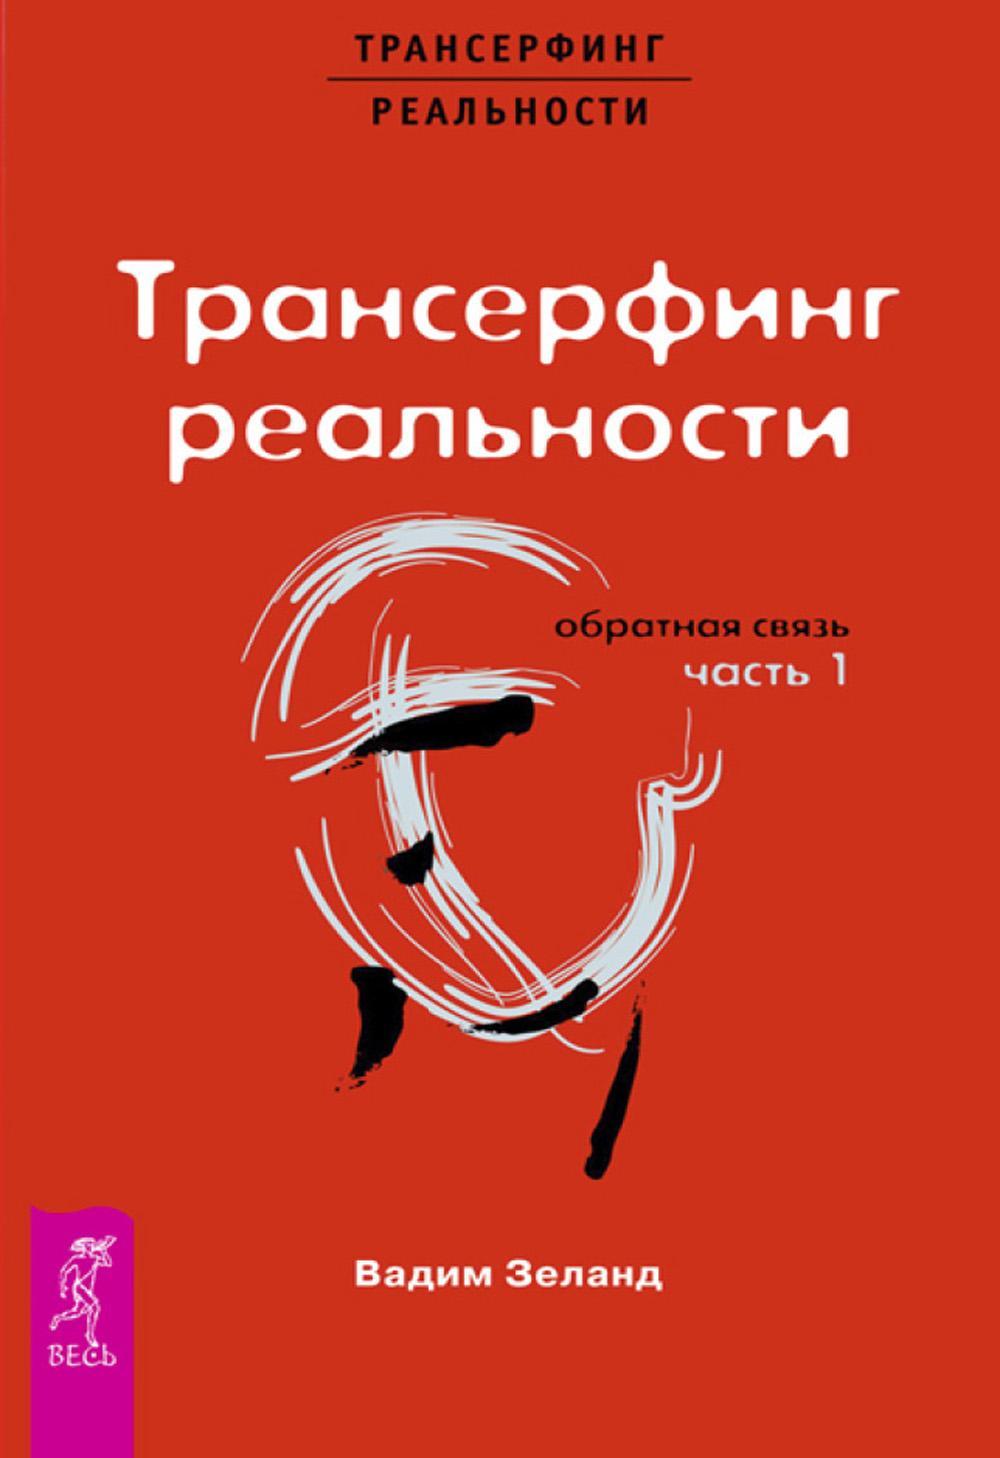 Трансерфинг реальности. Обратная связь | Вадим Зеланд | Книга и аудиокнига